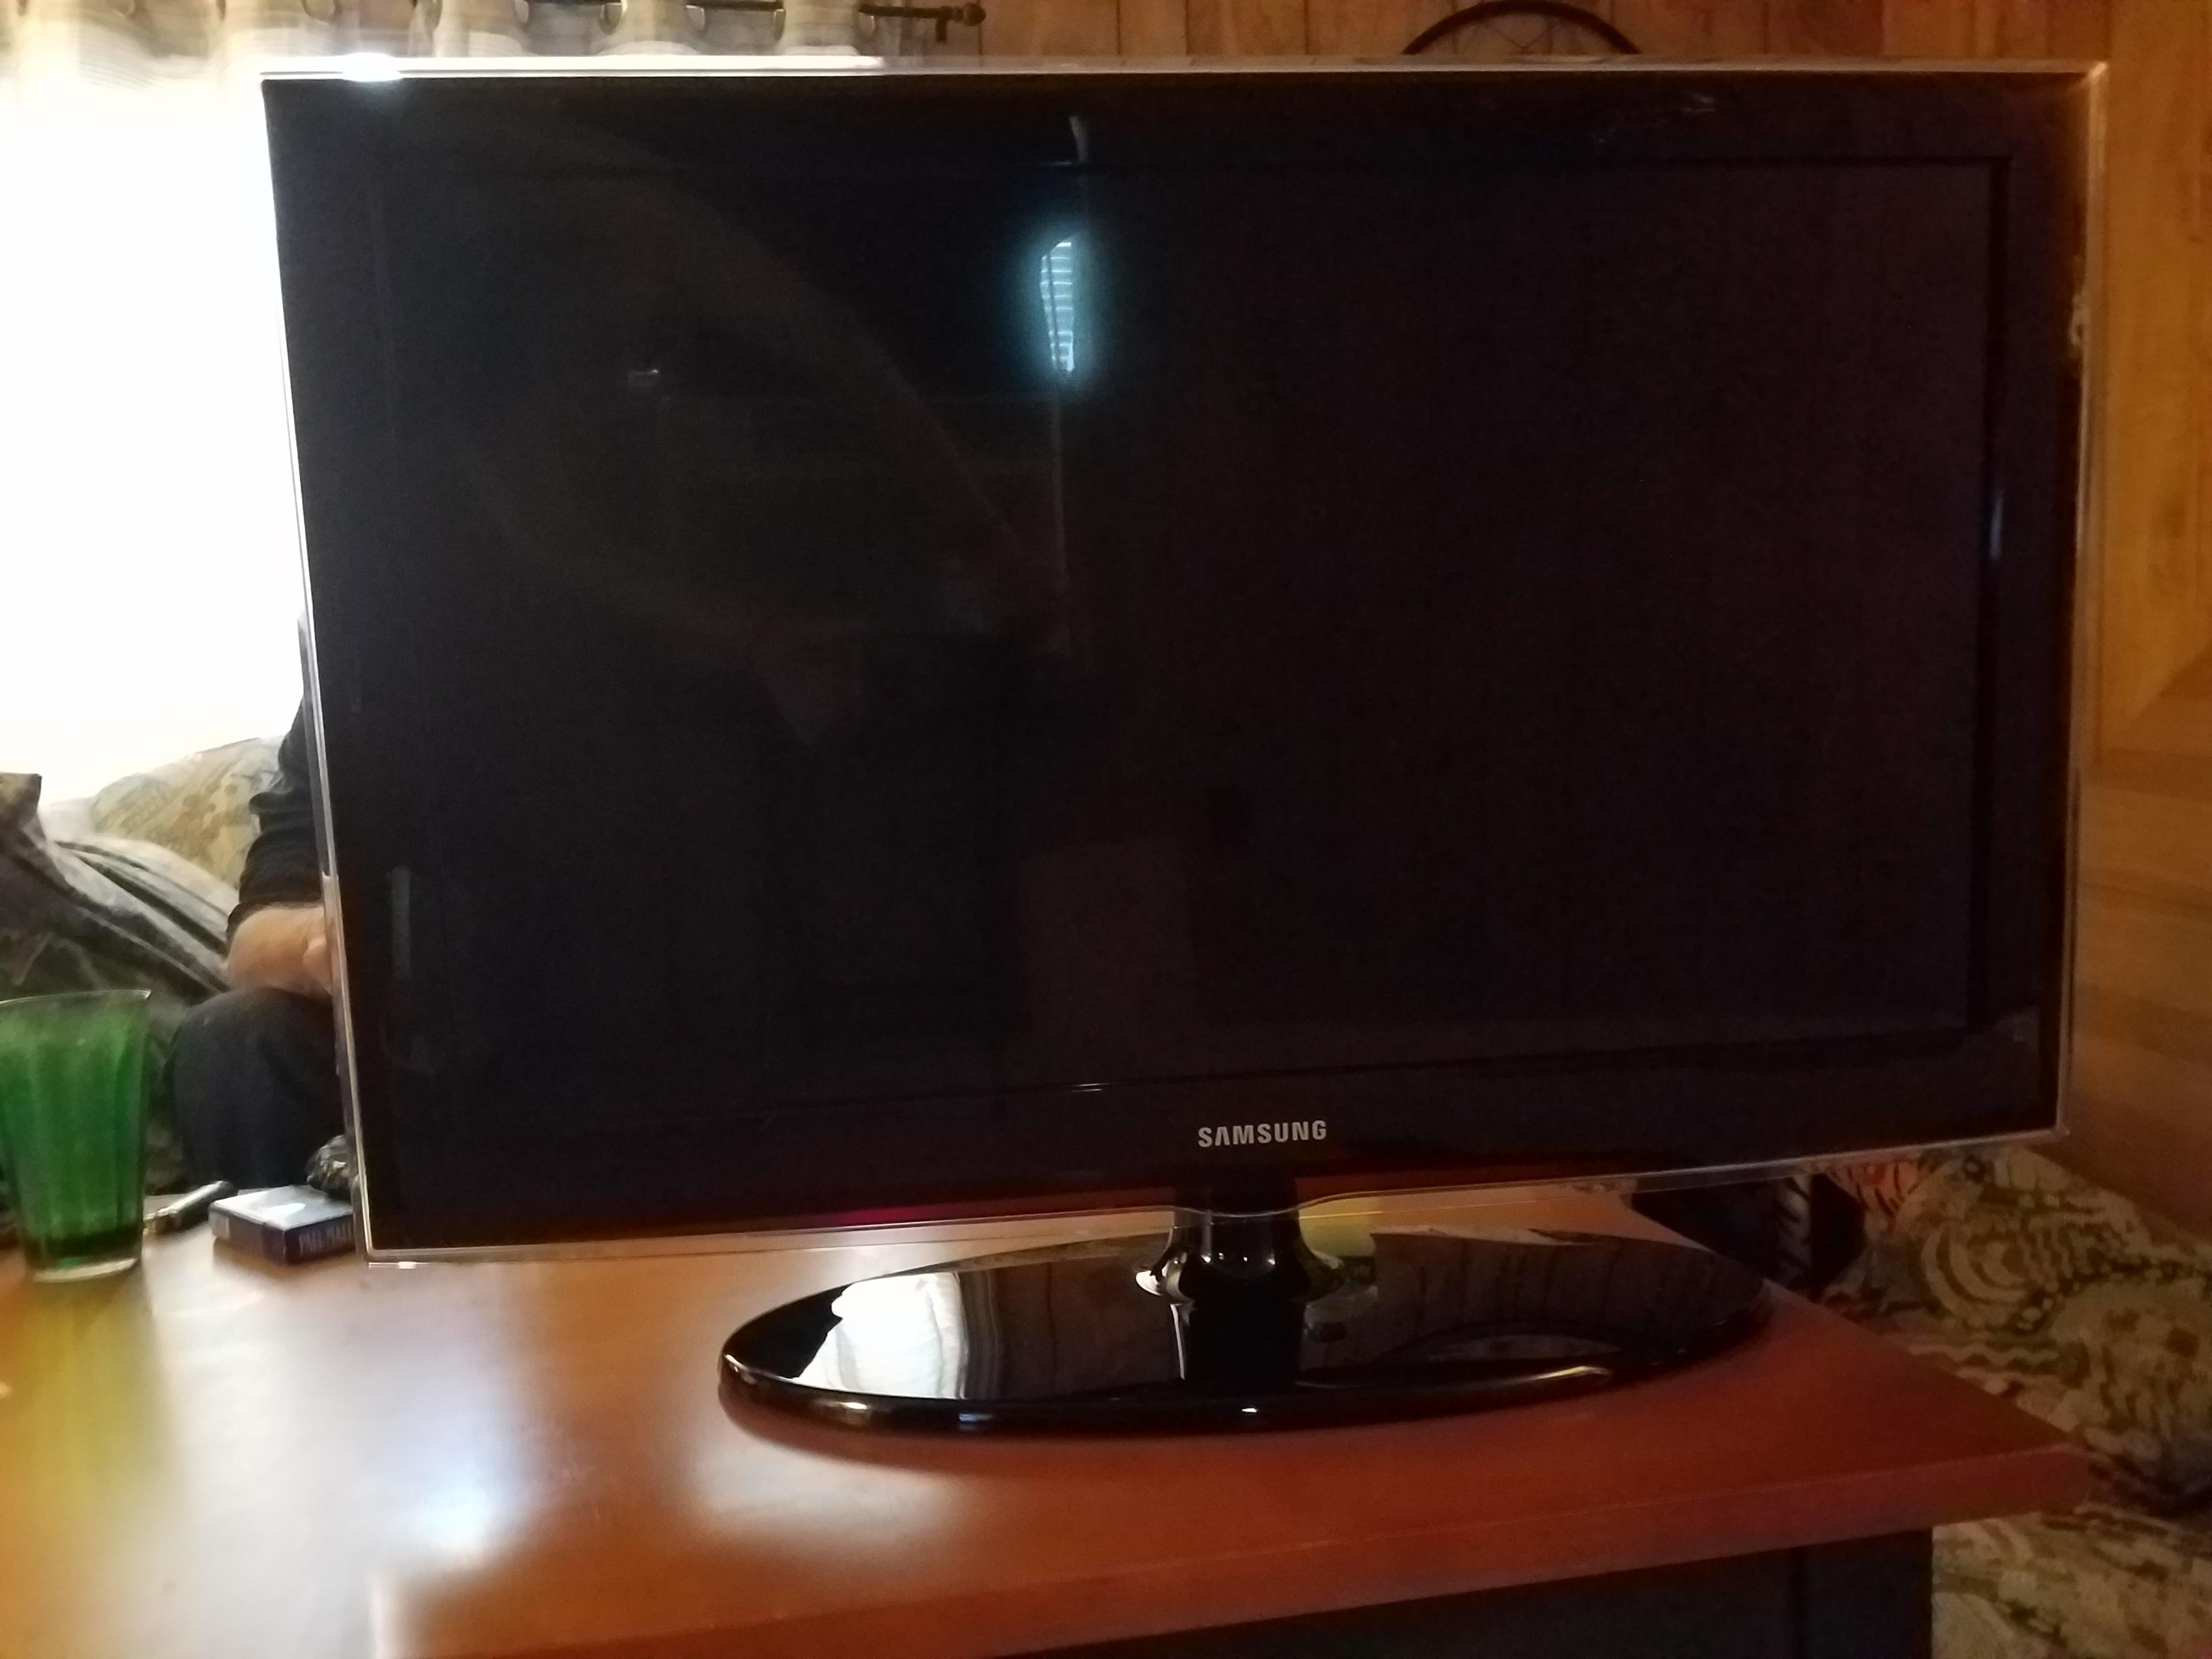 Samsung LED HD 1080p Smart TV